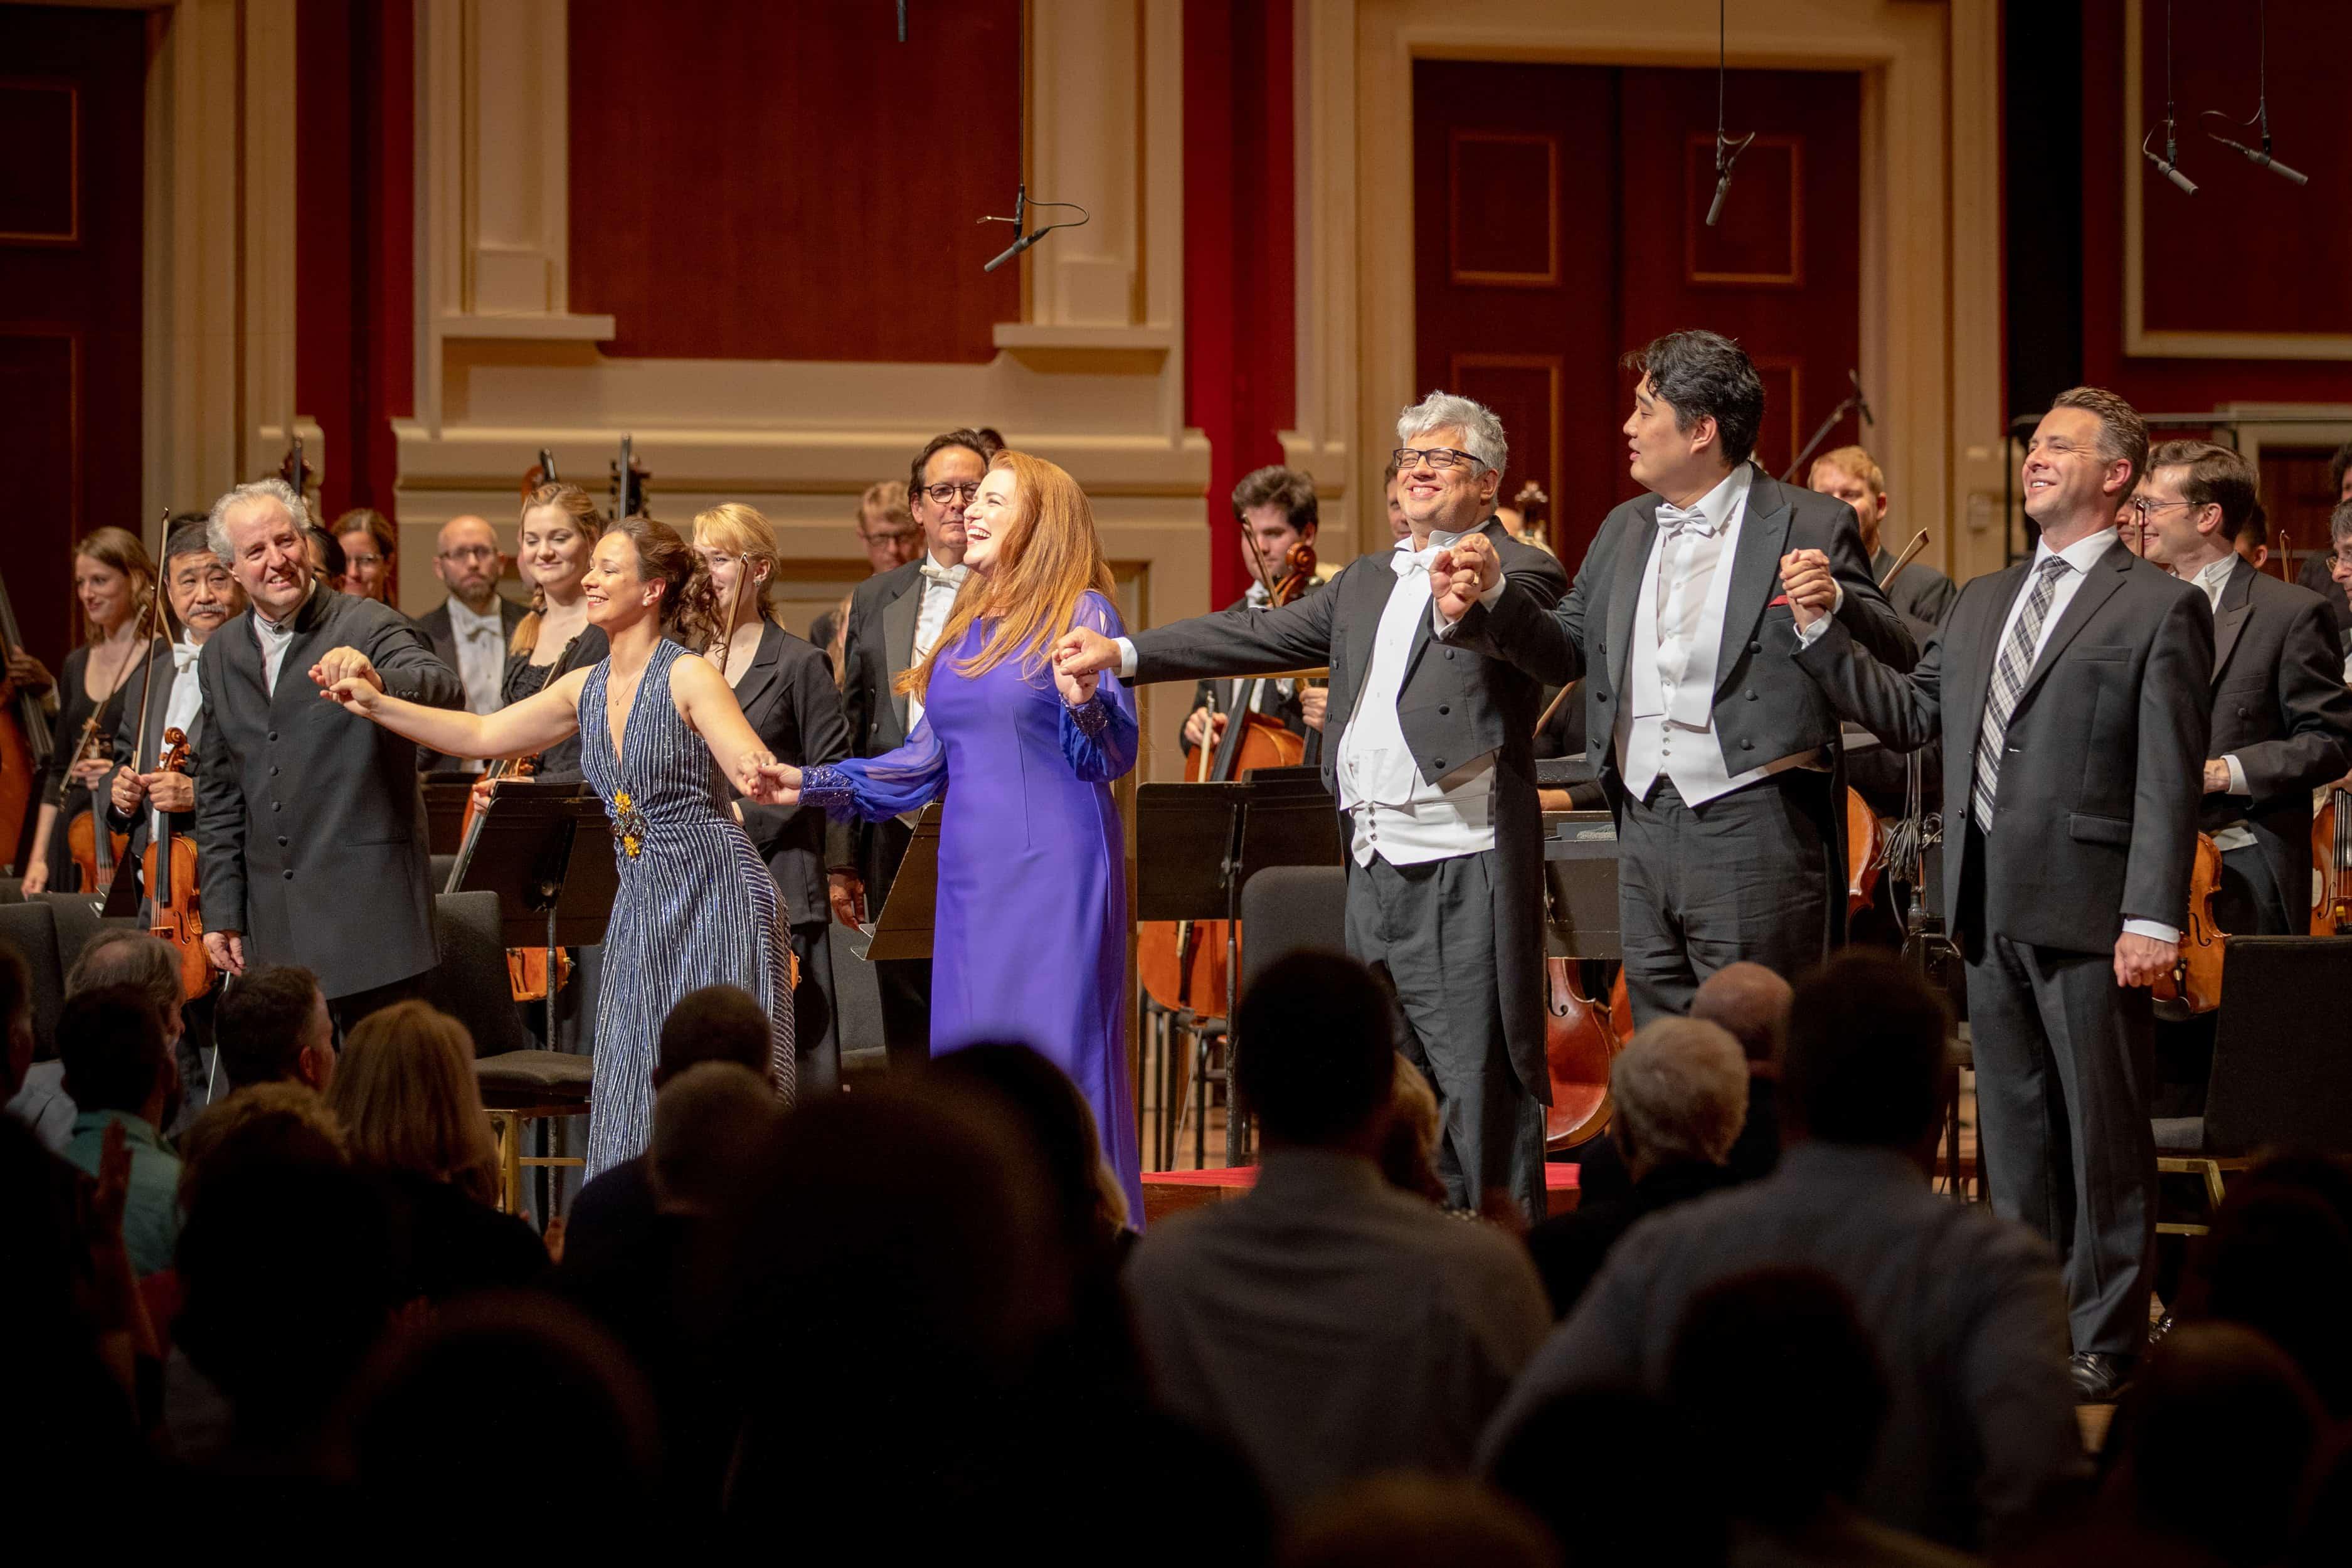 Beethoven 9 recording concert: Manfred Honeck, Christina Landshamer, Jennifer Johnson Cano, Werner Güra, Shenyang, Matthew Mehaffey © Pittsburgh Symphony Orchestra